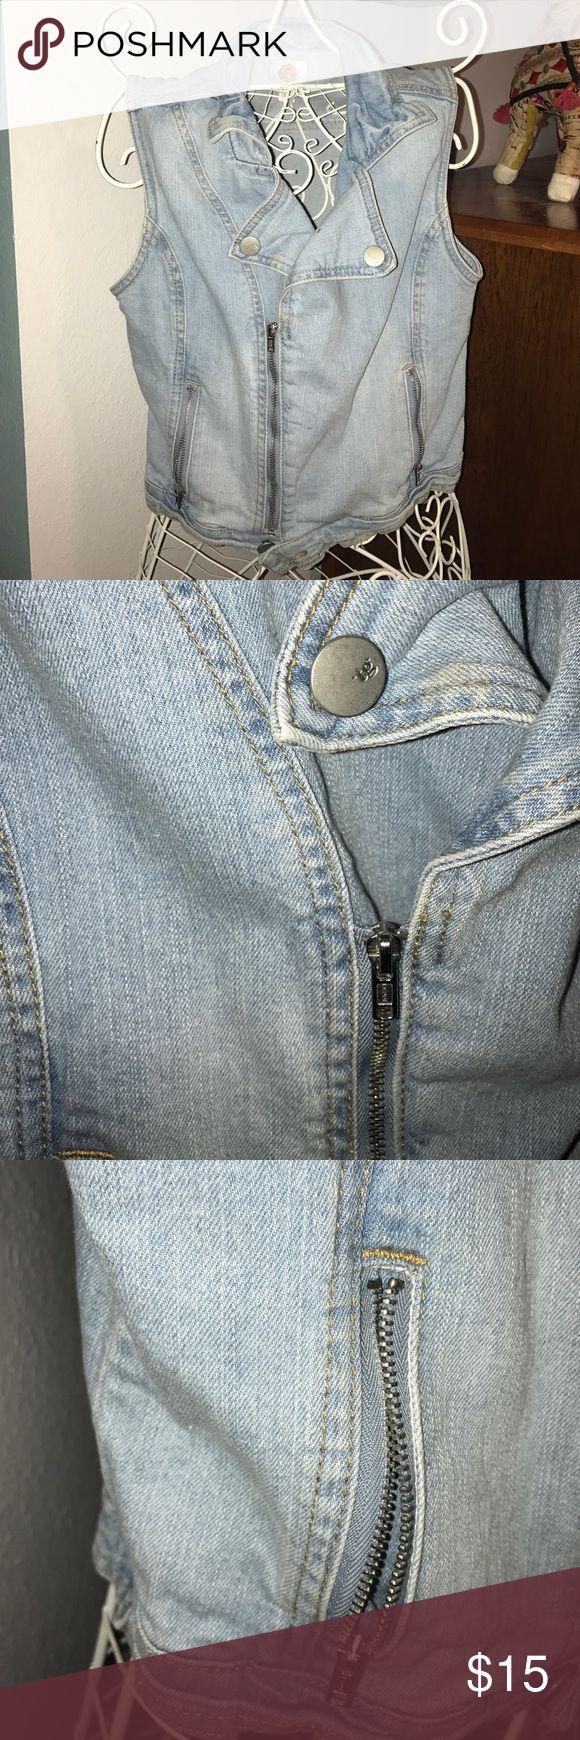 Light wash sleeveless denim jacket Light wash denim jacket with zip up details Size XL in children's total girl Jackets & Coats Jean Jackets